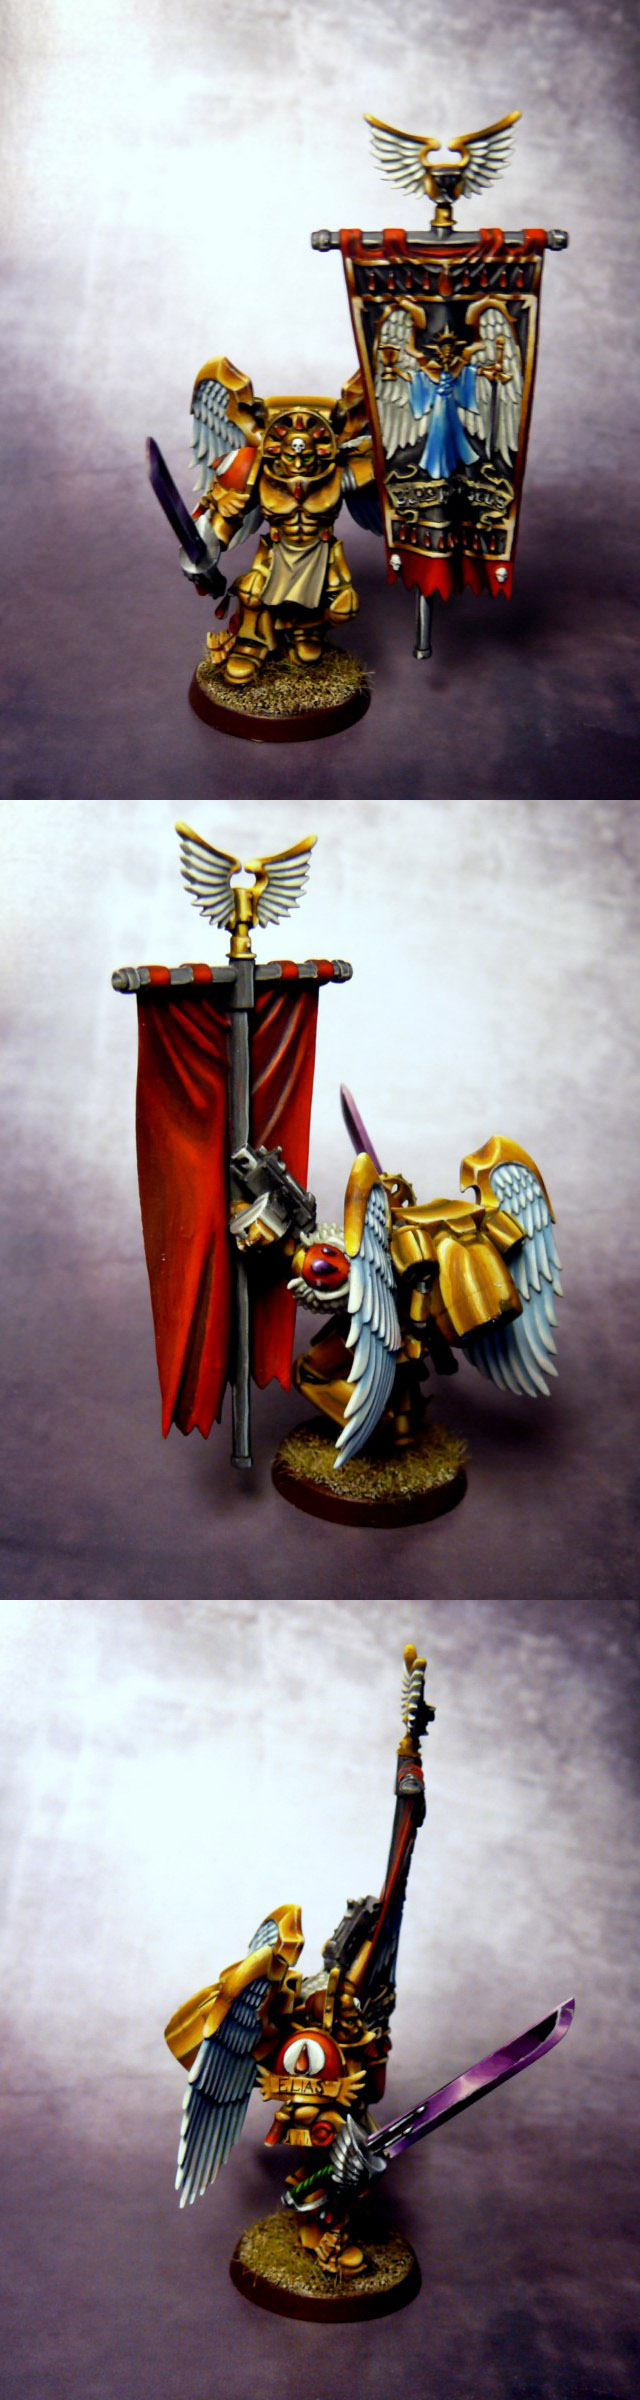 Blood Angels Sanguinary Guard NMM Standard Bearer